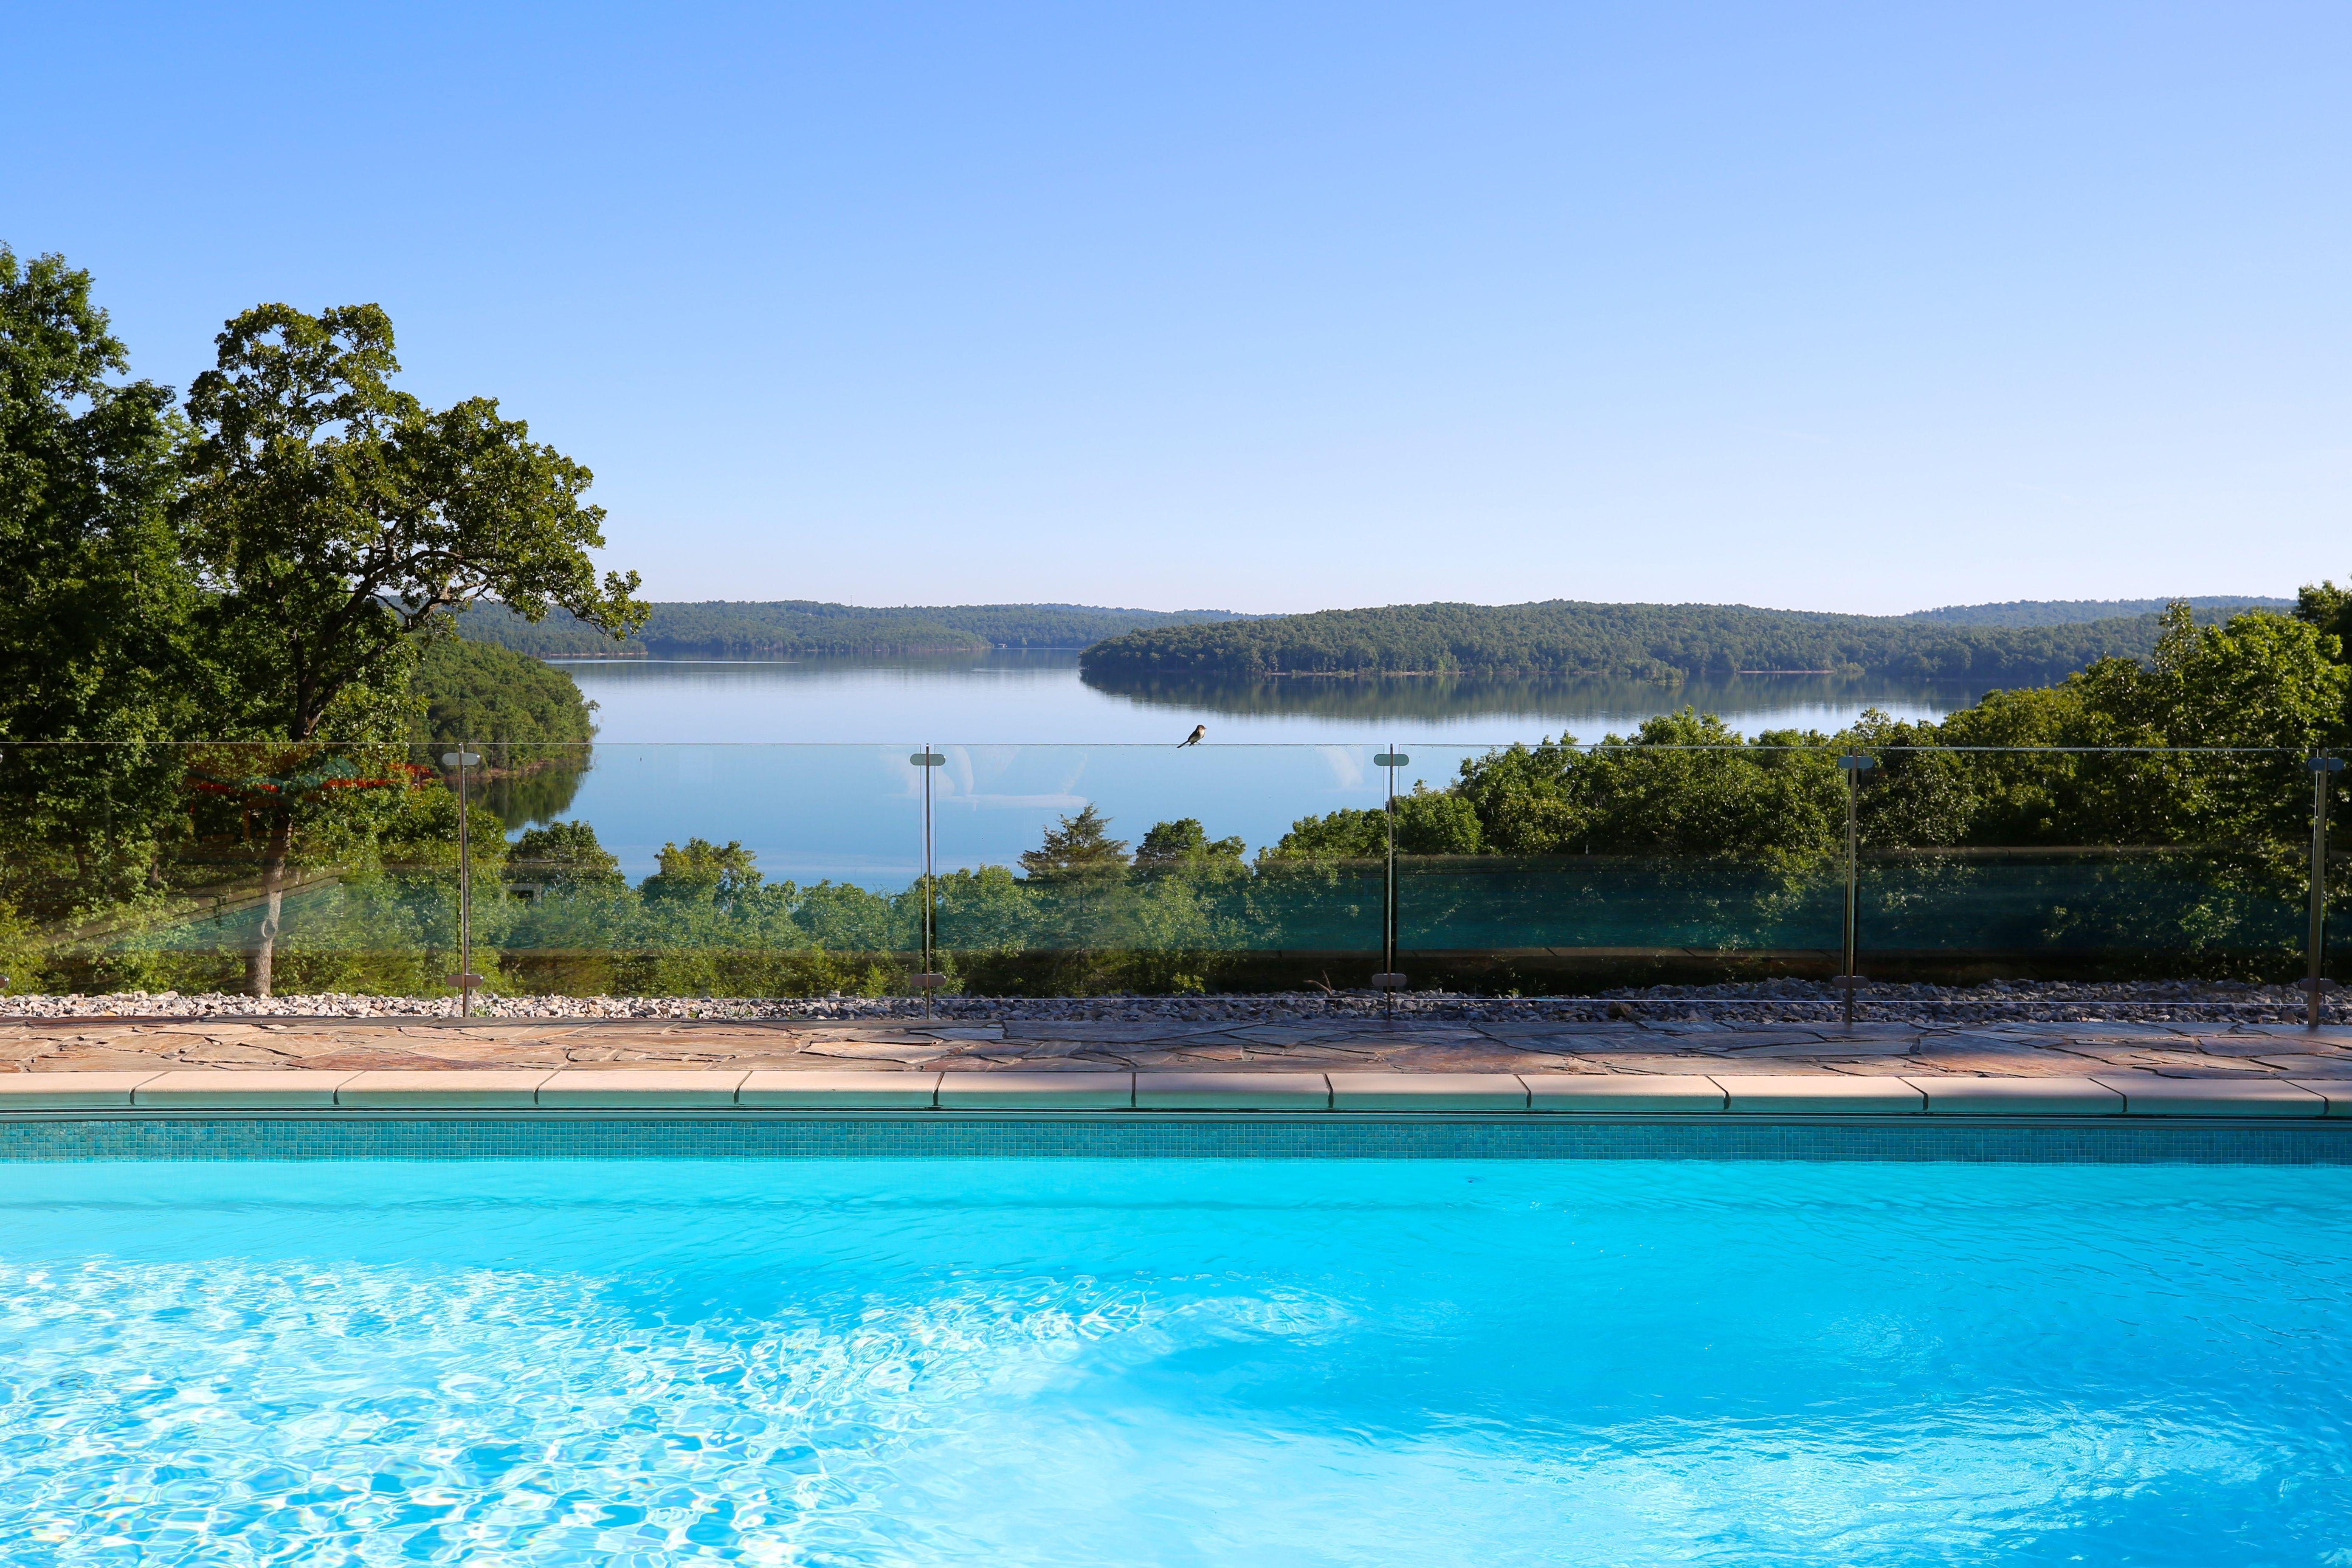 Luxury lake house lake house rentals vacation lake view